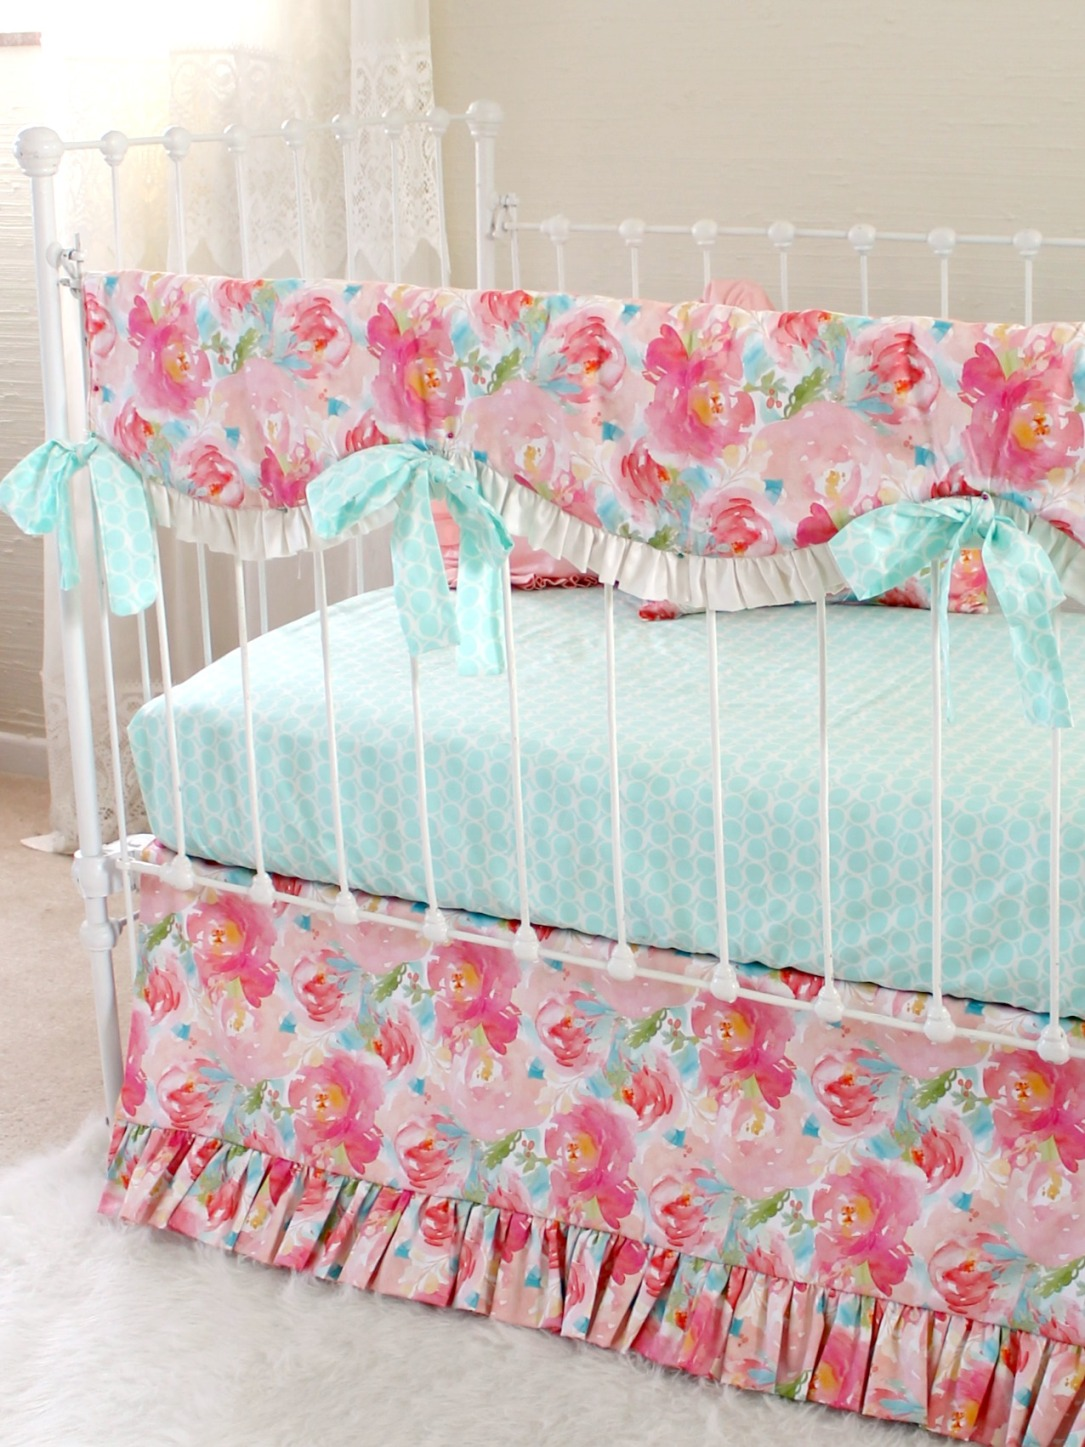 Pastel Peonies Floral Bumperless Crib Bedding  Lottie Da Baby